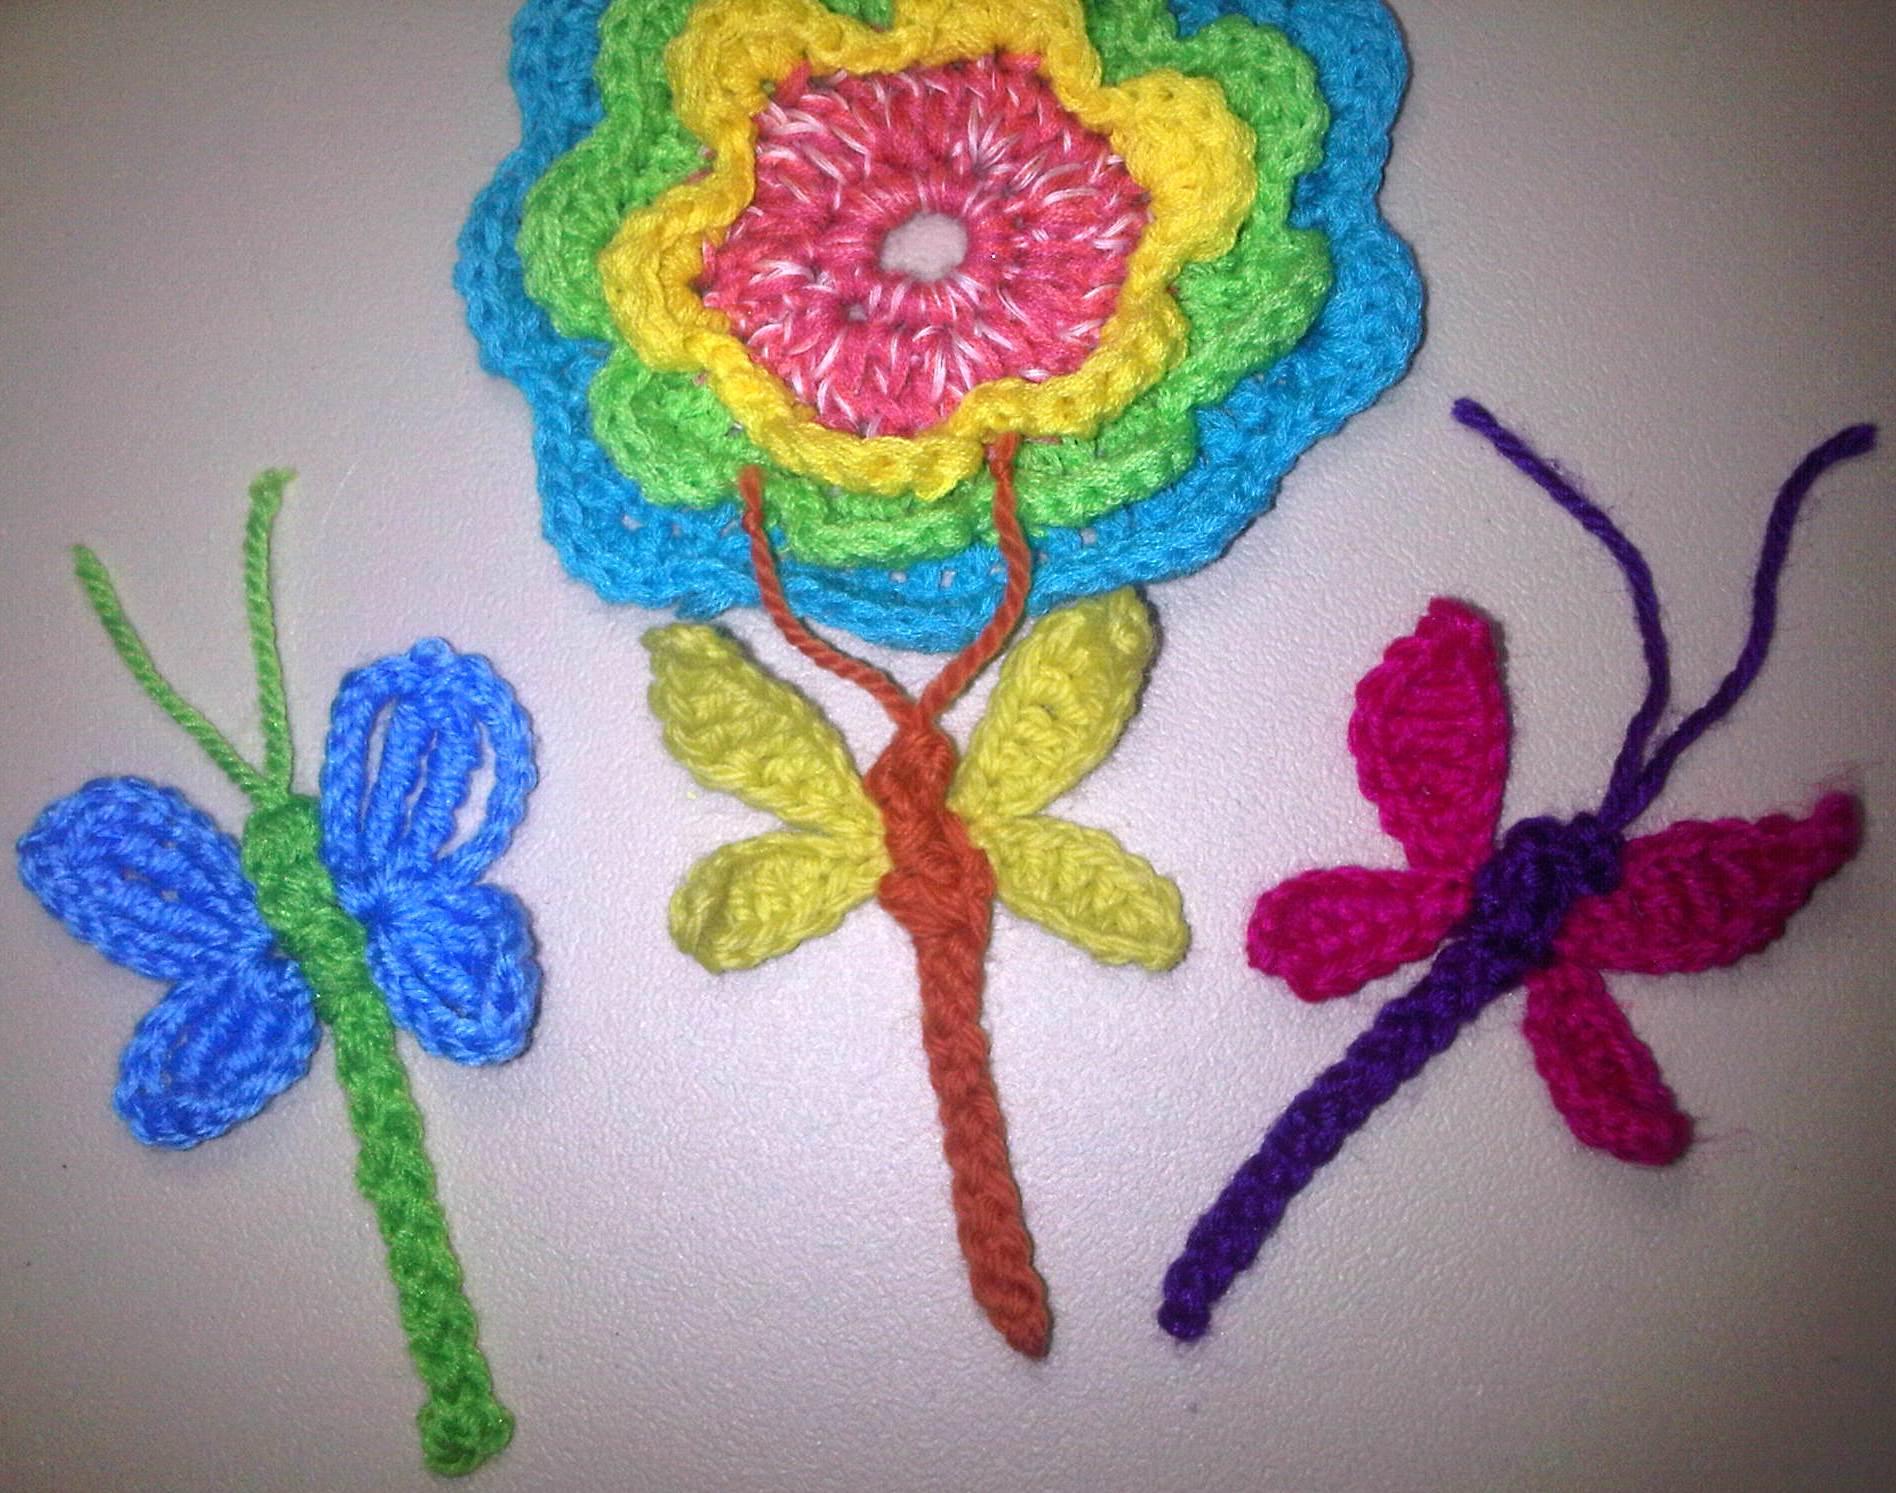 Contemporáneo Directorio De Patrón De Crochet Libre Molde - Ideas de ...